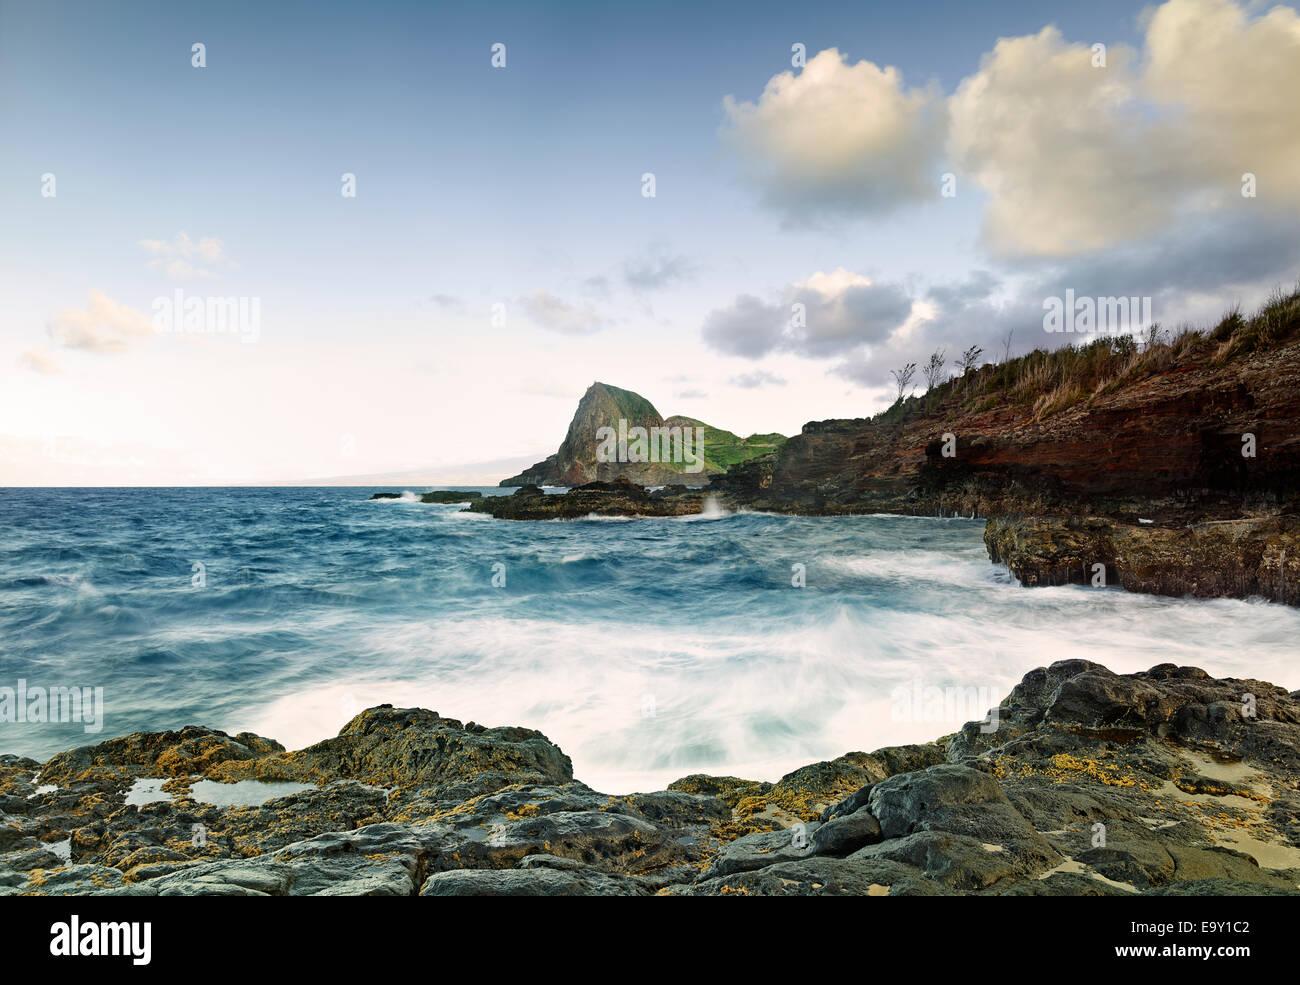 Coastline at Kahakuloa Bay, Maui, Hawaii, United States - Stock Image